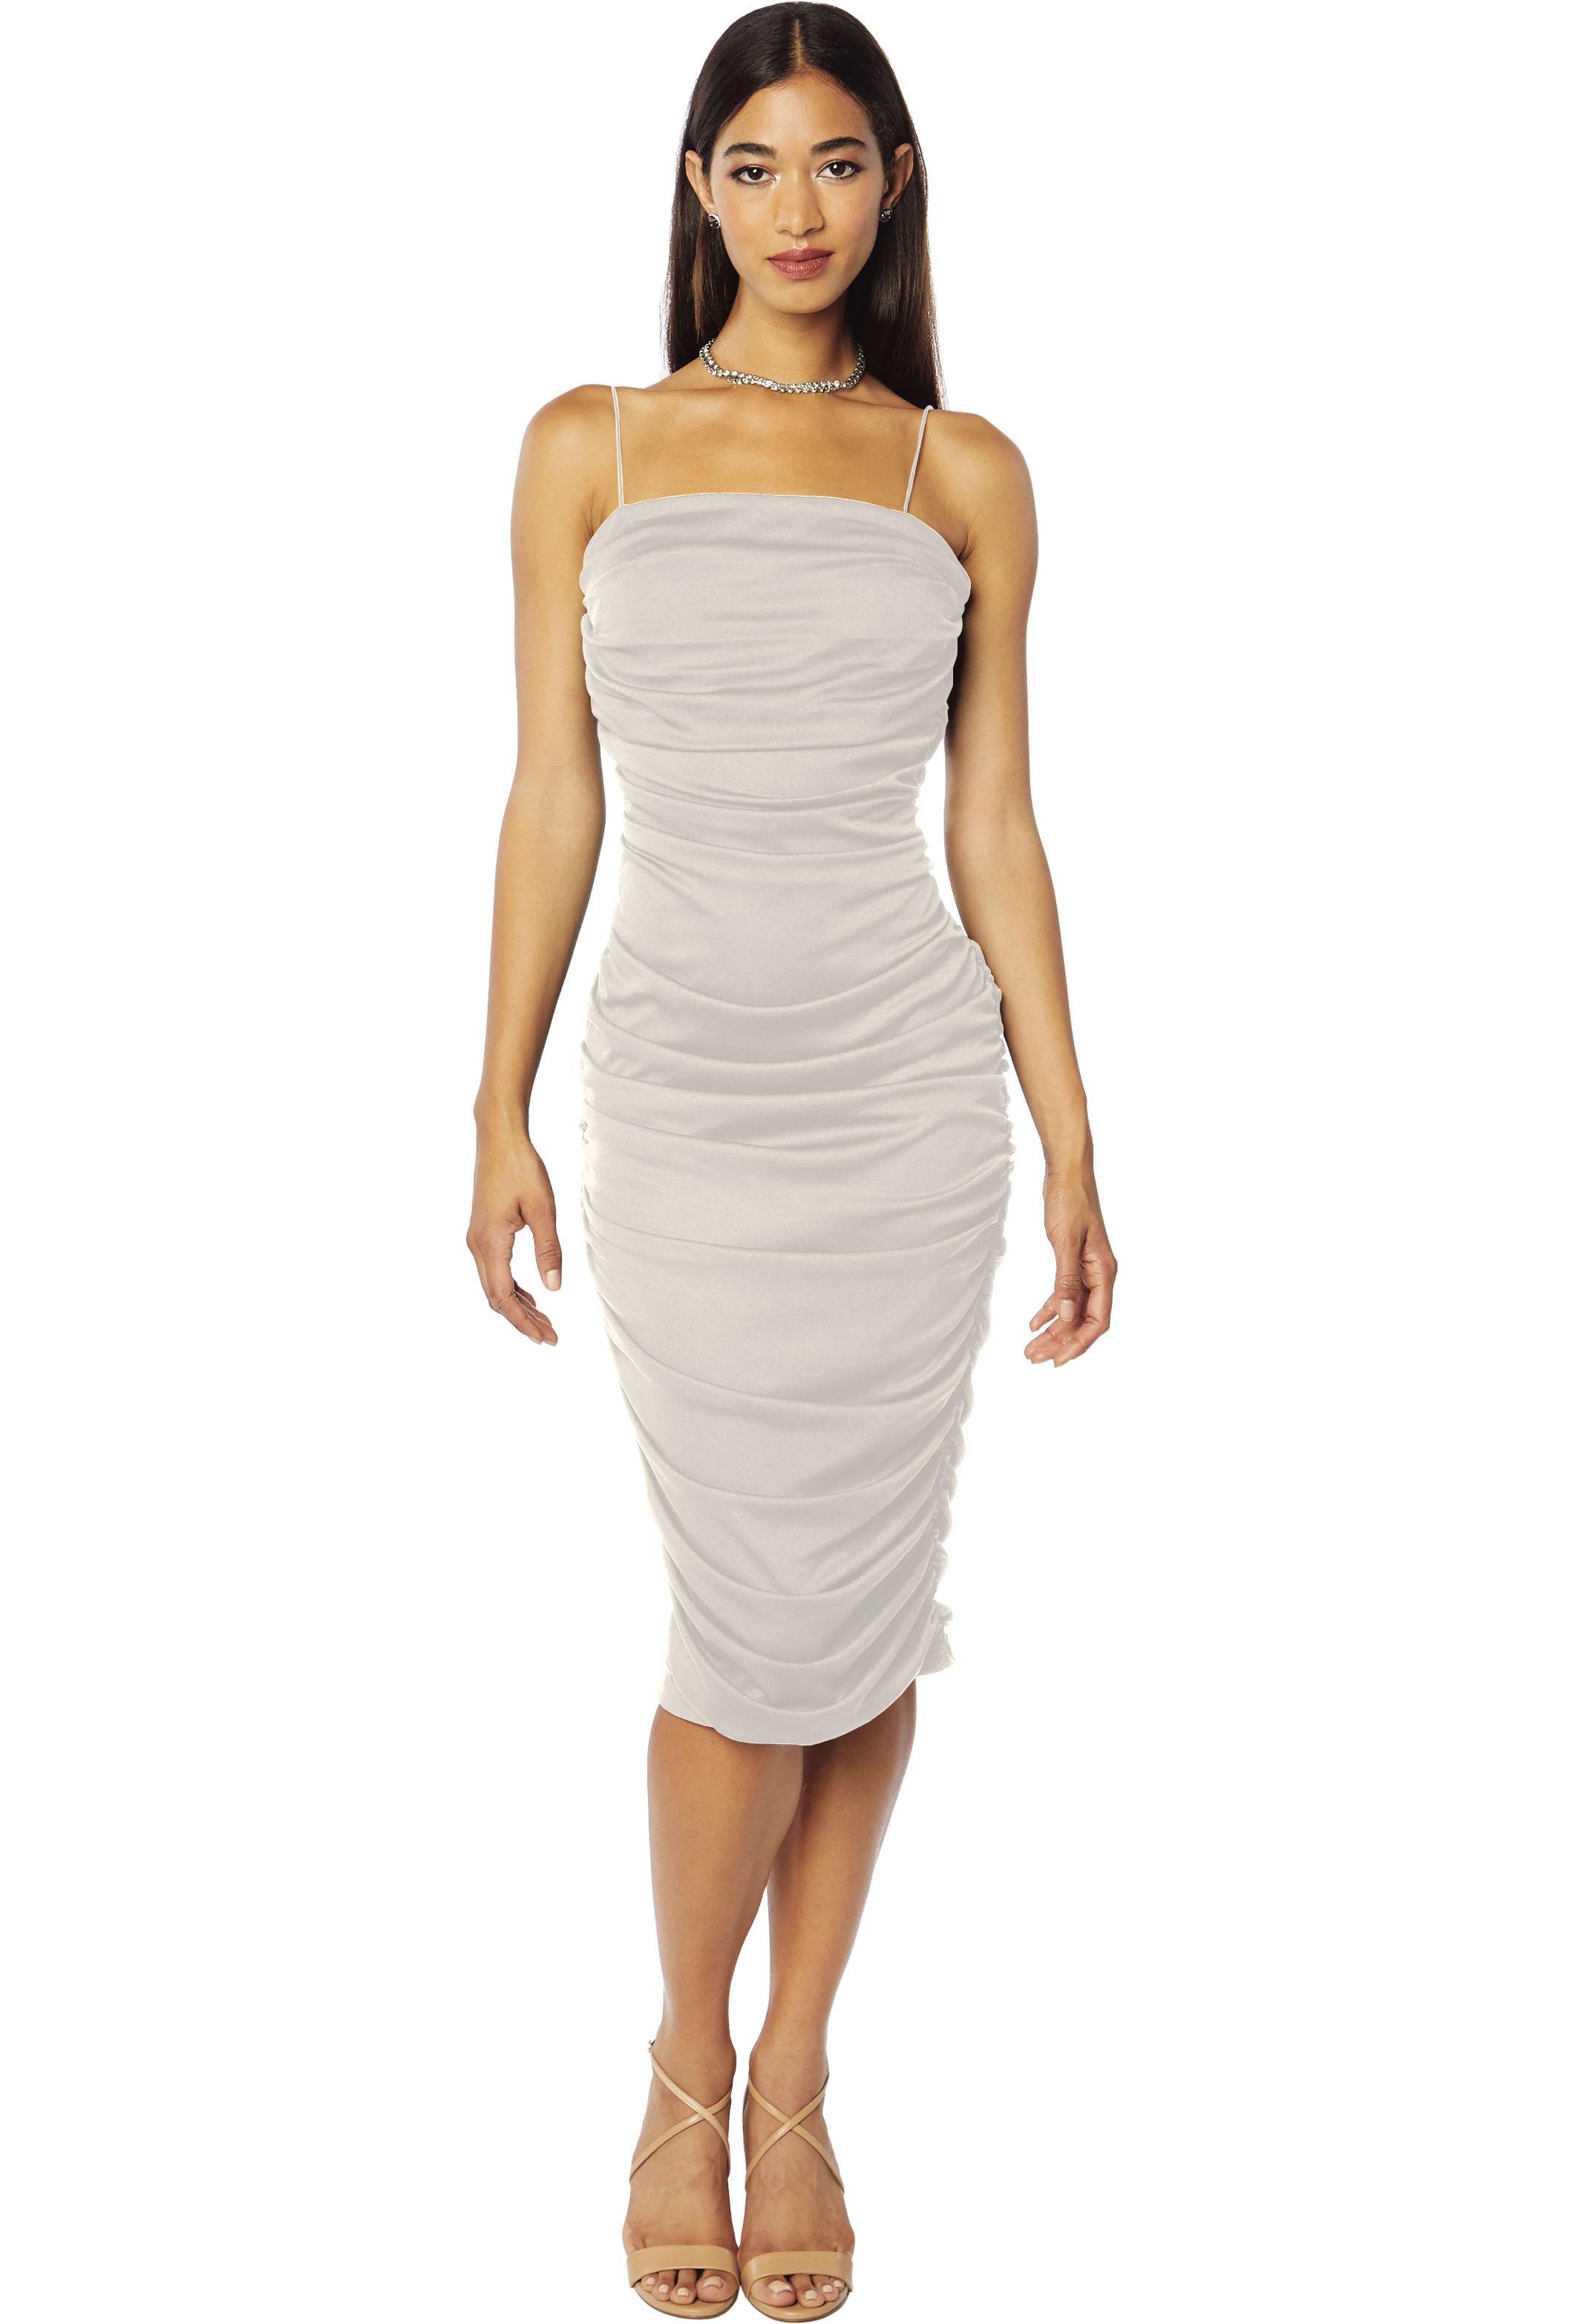 Bill Levkoff DESERT GREY Chiffon Square  gown, $138.00 Front